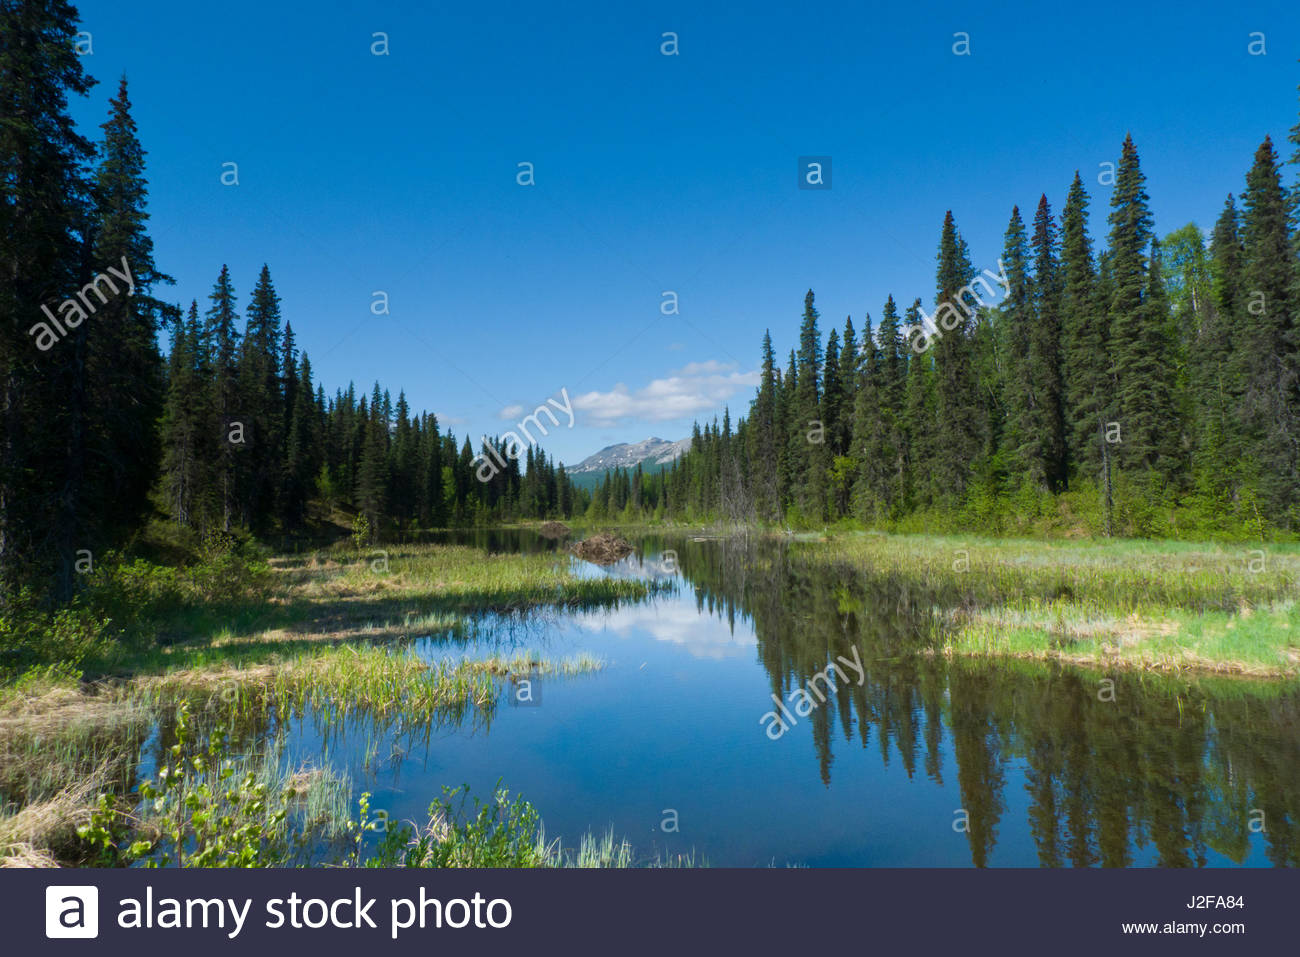 Alaska matanuska susitna county talkeetna - Fresh Water Lake Formed By A Beaver Dam Talkeetna Mountains Matanuska Susitna Borough Alaska Usa